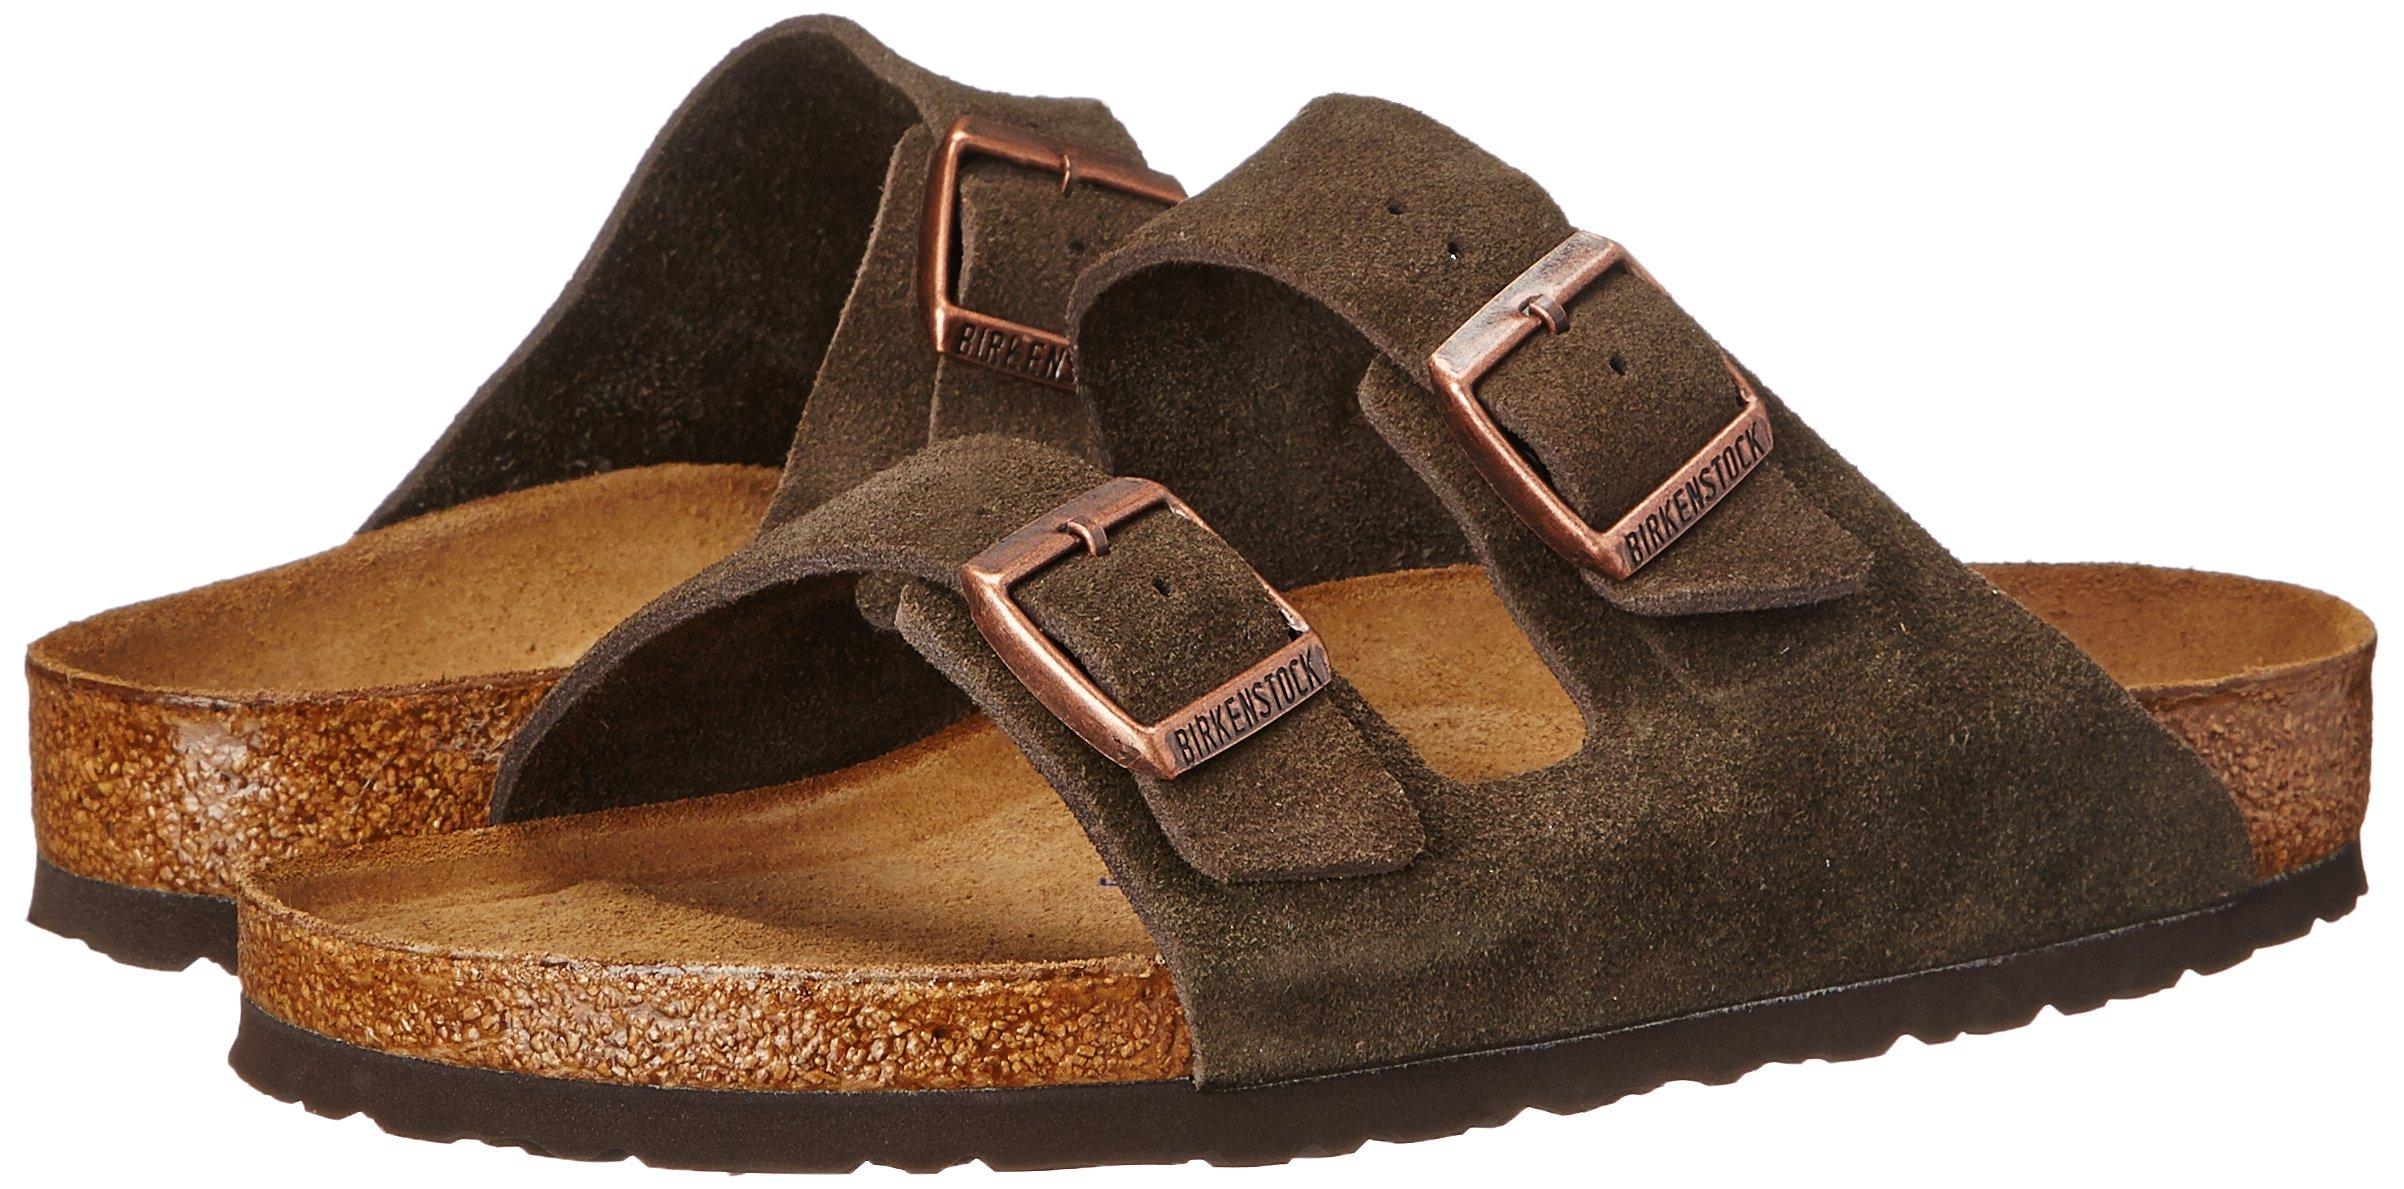 Birkenstock Unisex Arizona Mocha Suede Sandals - 35 N EU / 4-4.5 2A(N) US by Birkenstock (Image #6)